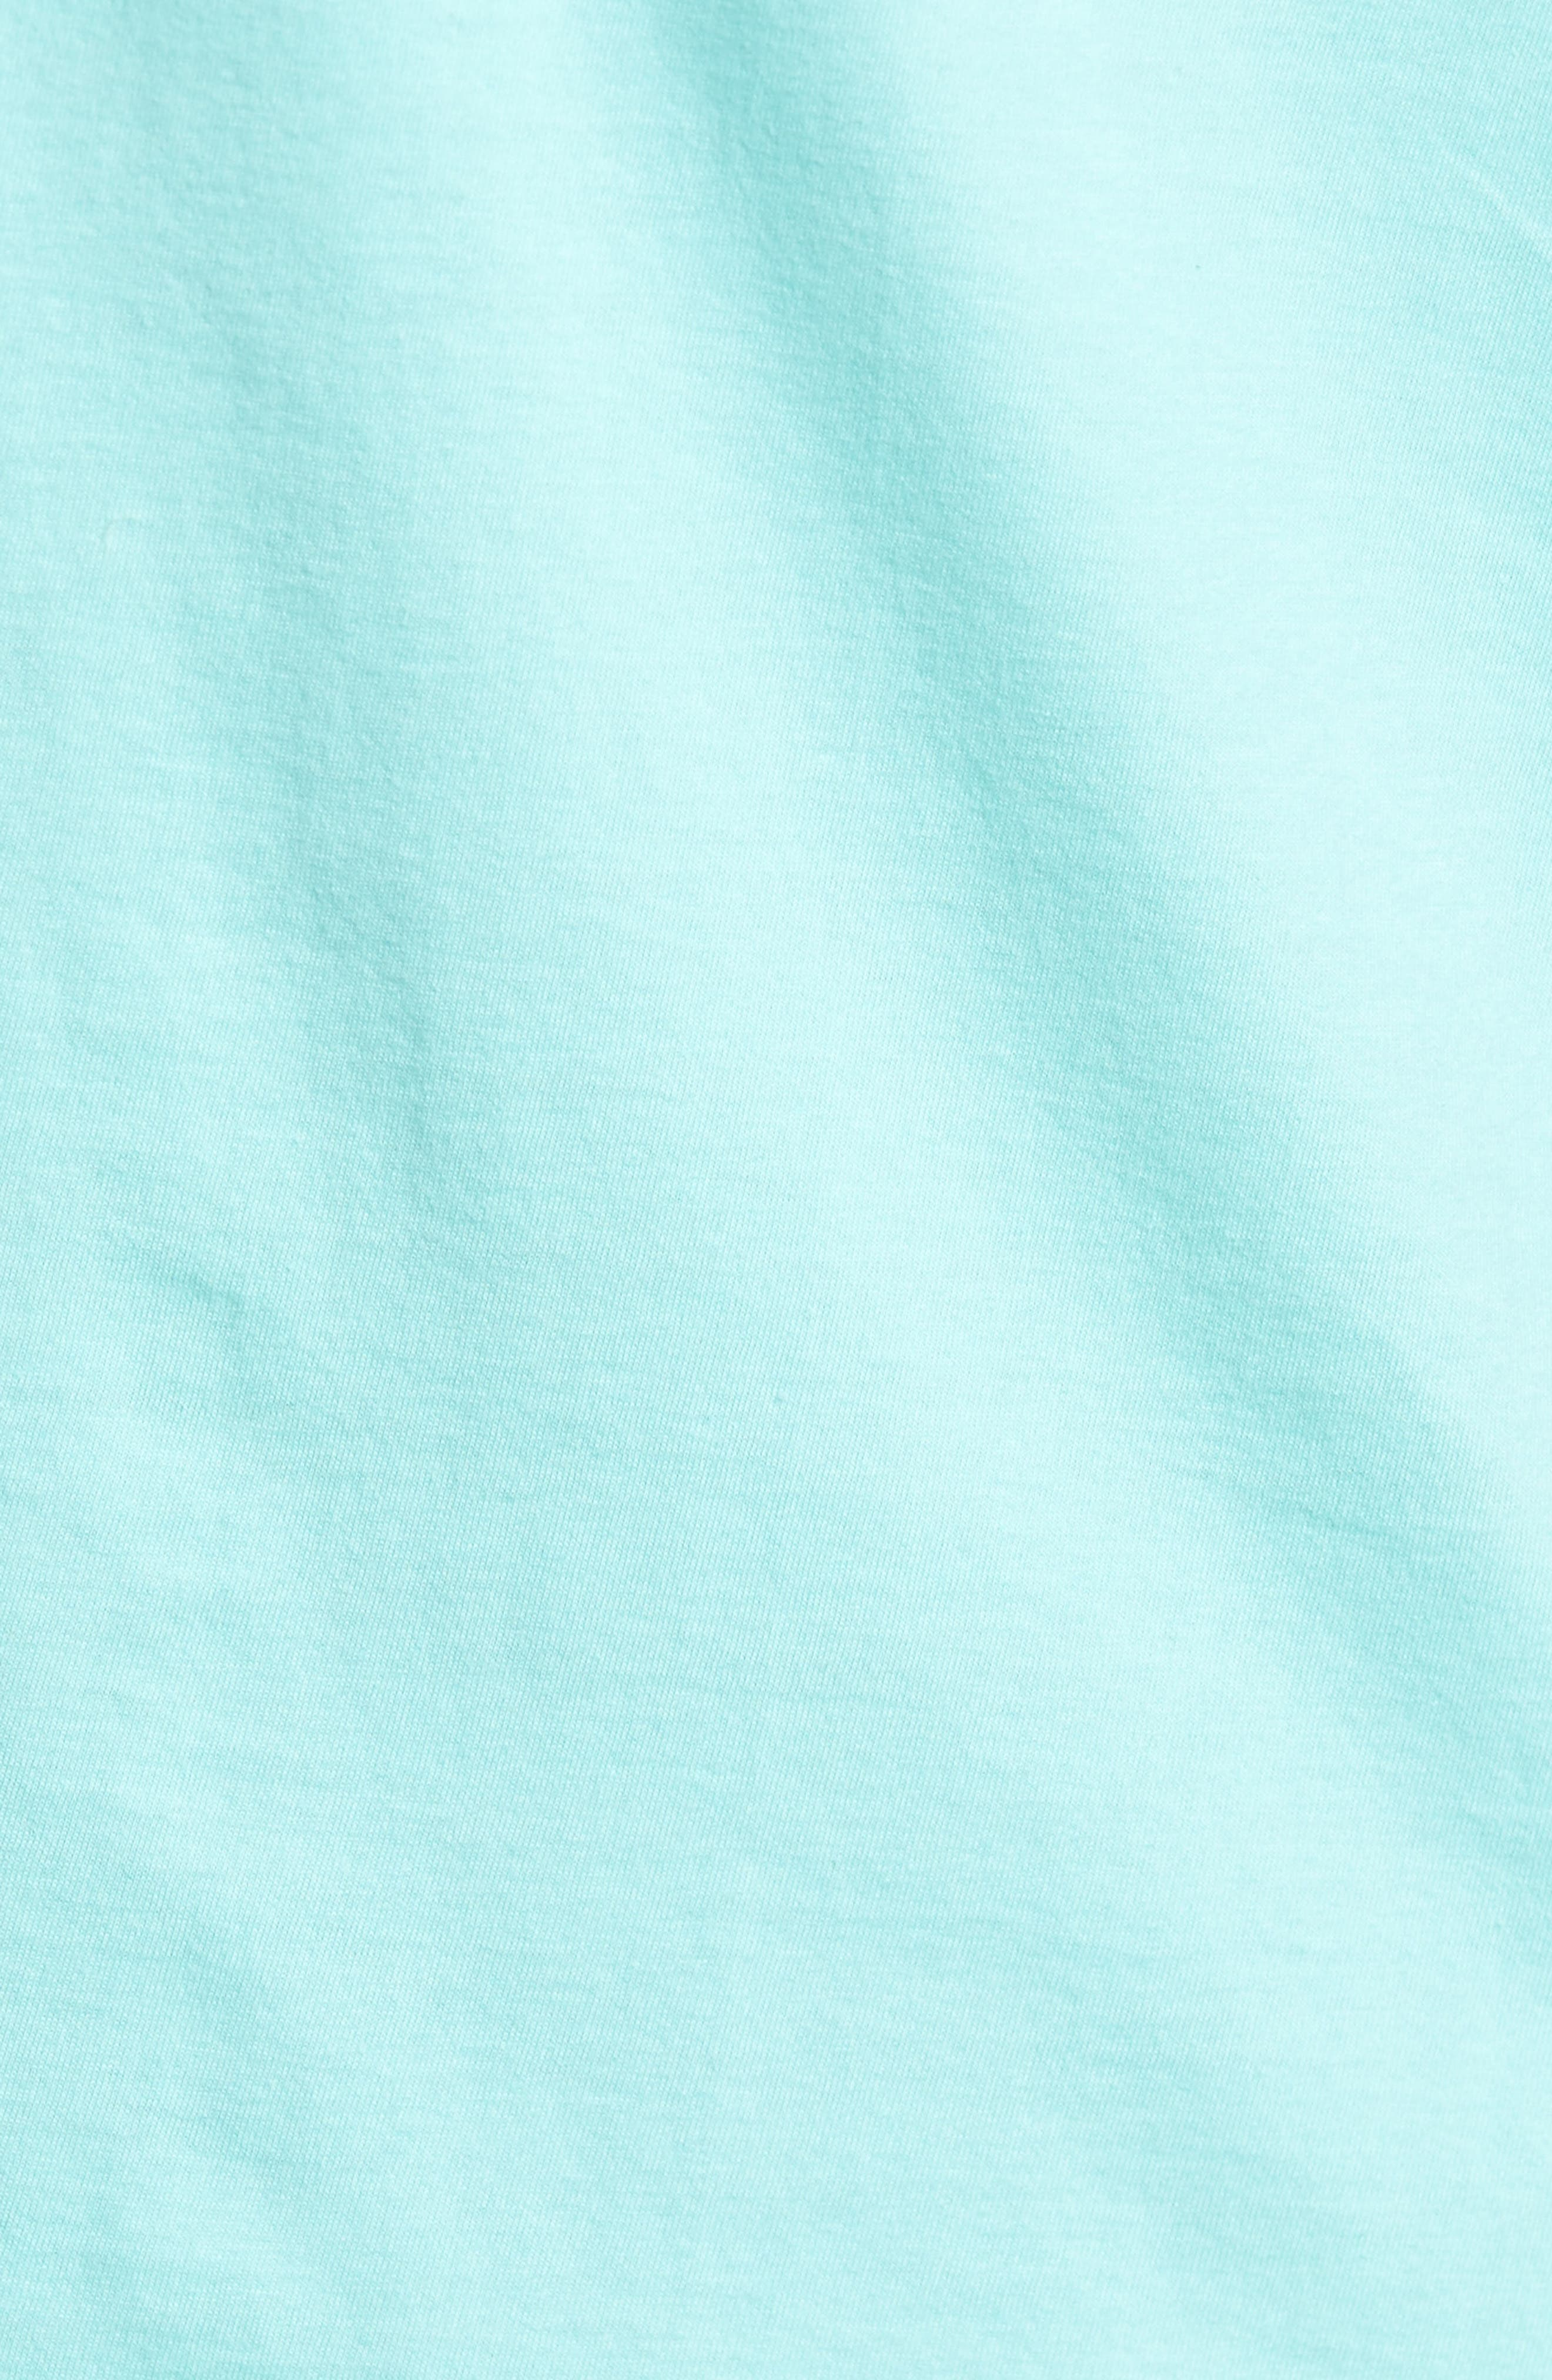 Can You Feel It Premium T-Shirt,                             Alternate thumbnail 5, color,                             450